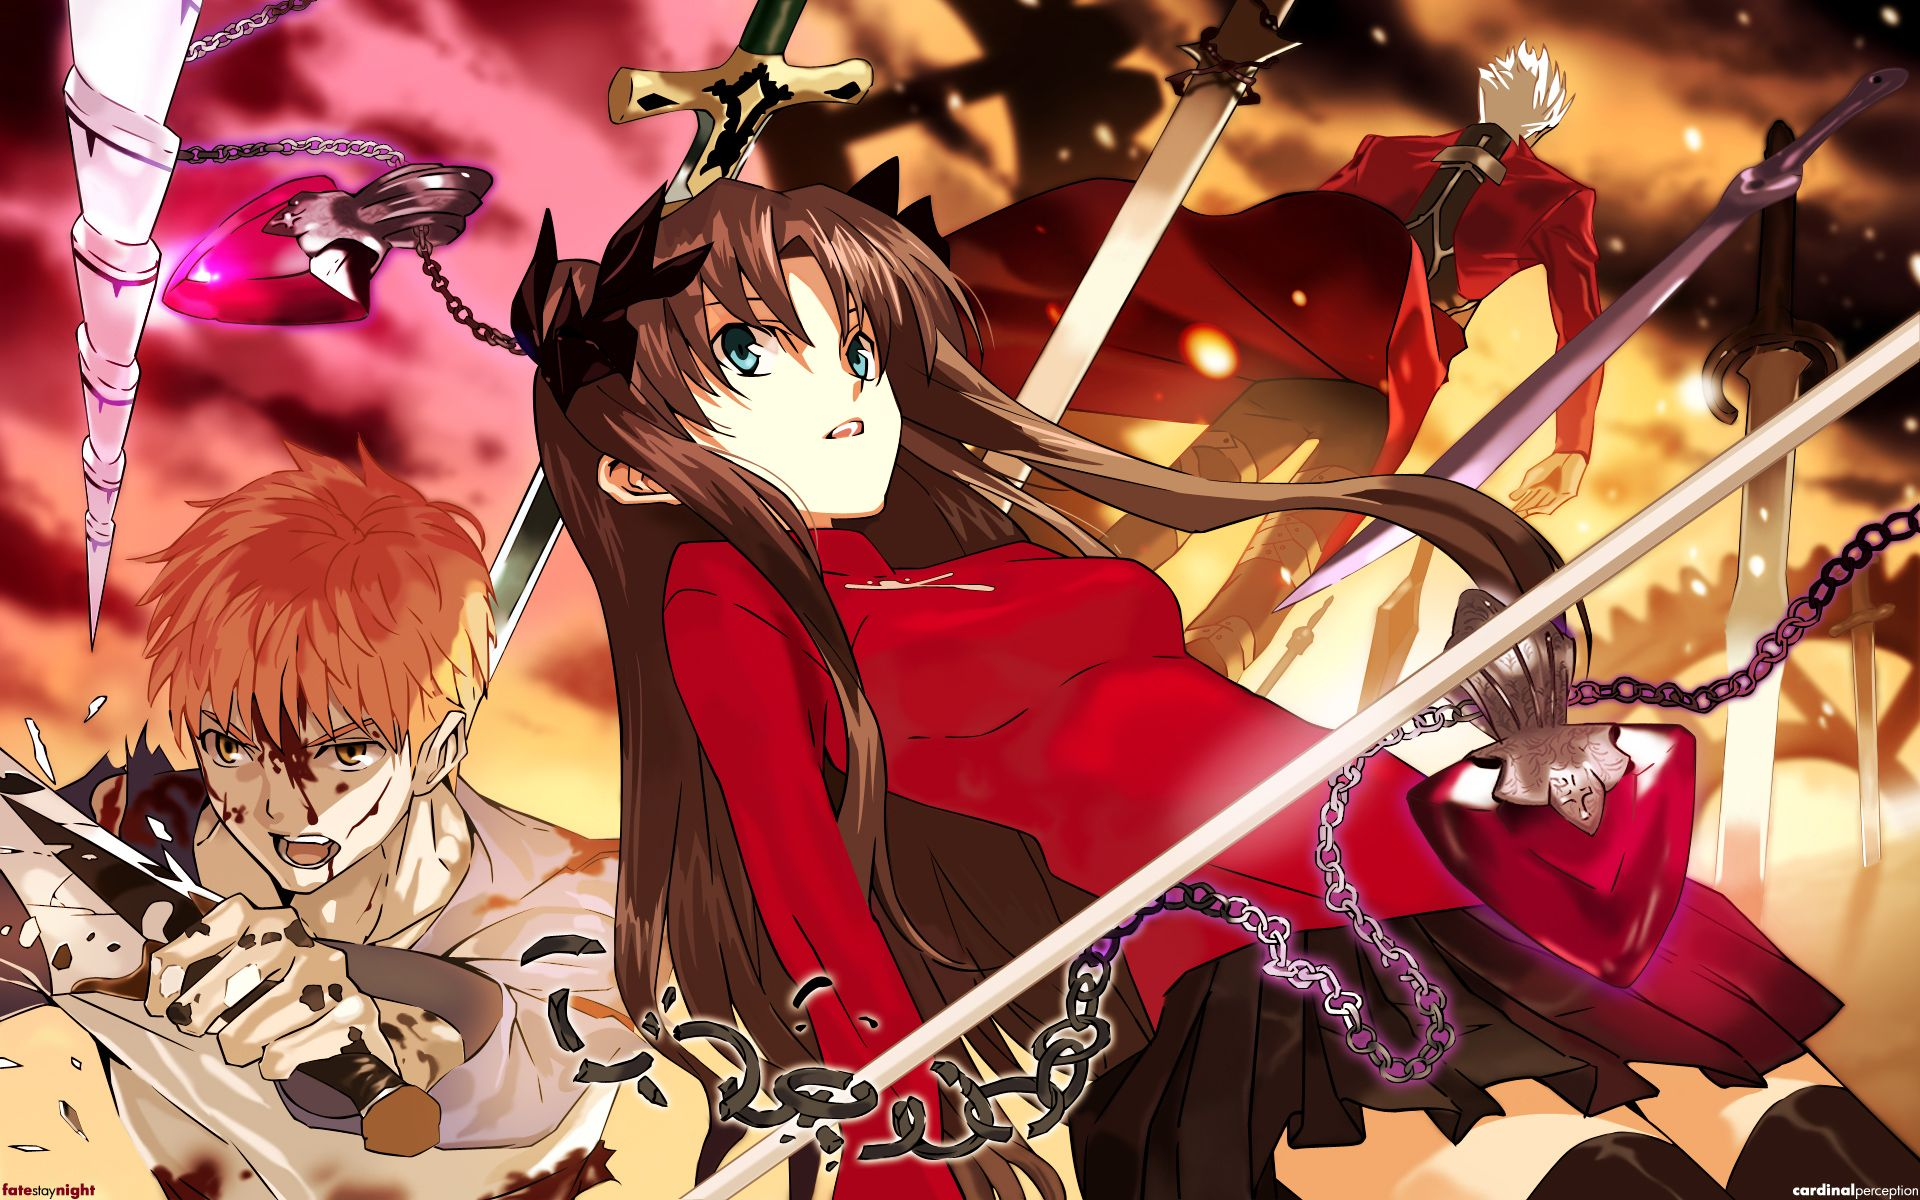 Minitokyo_Fate-Stay_Night_Wallpapers_386268.jpg